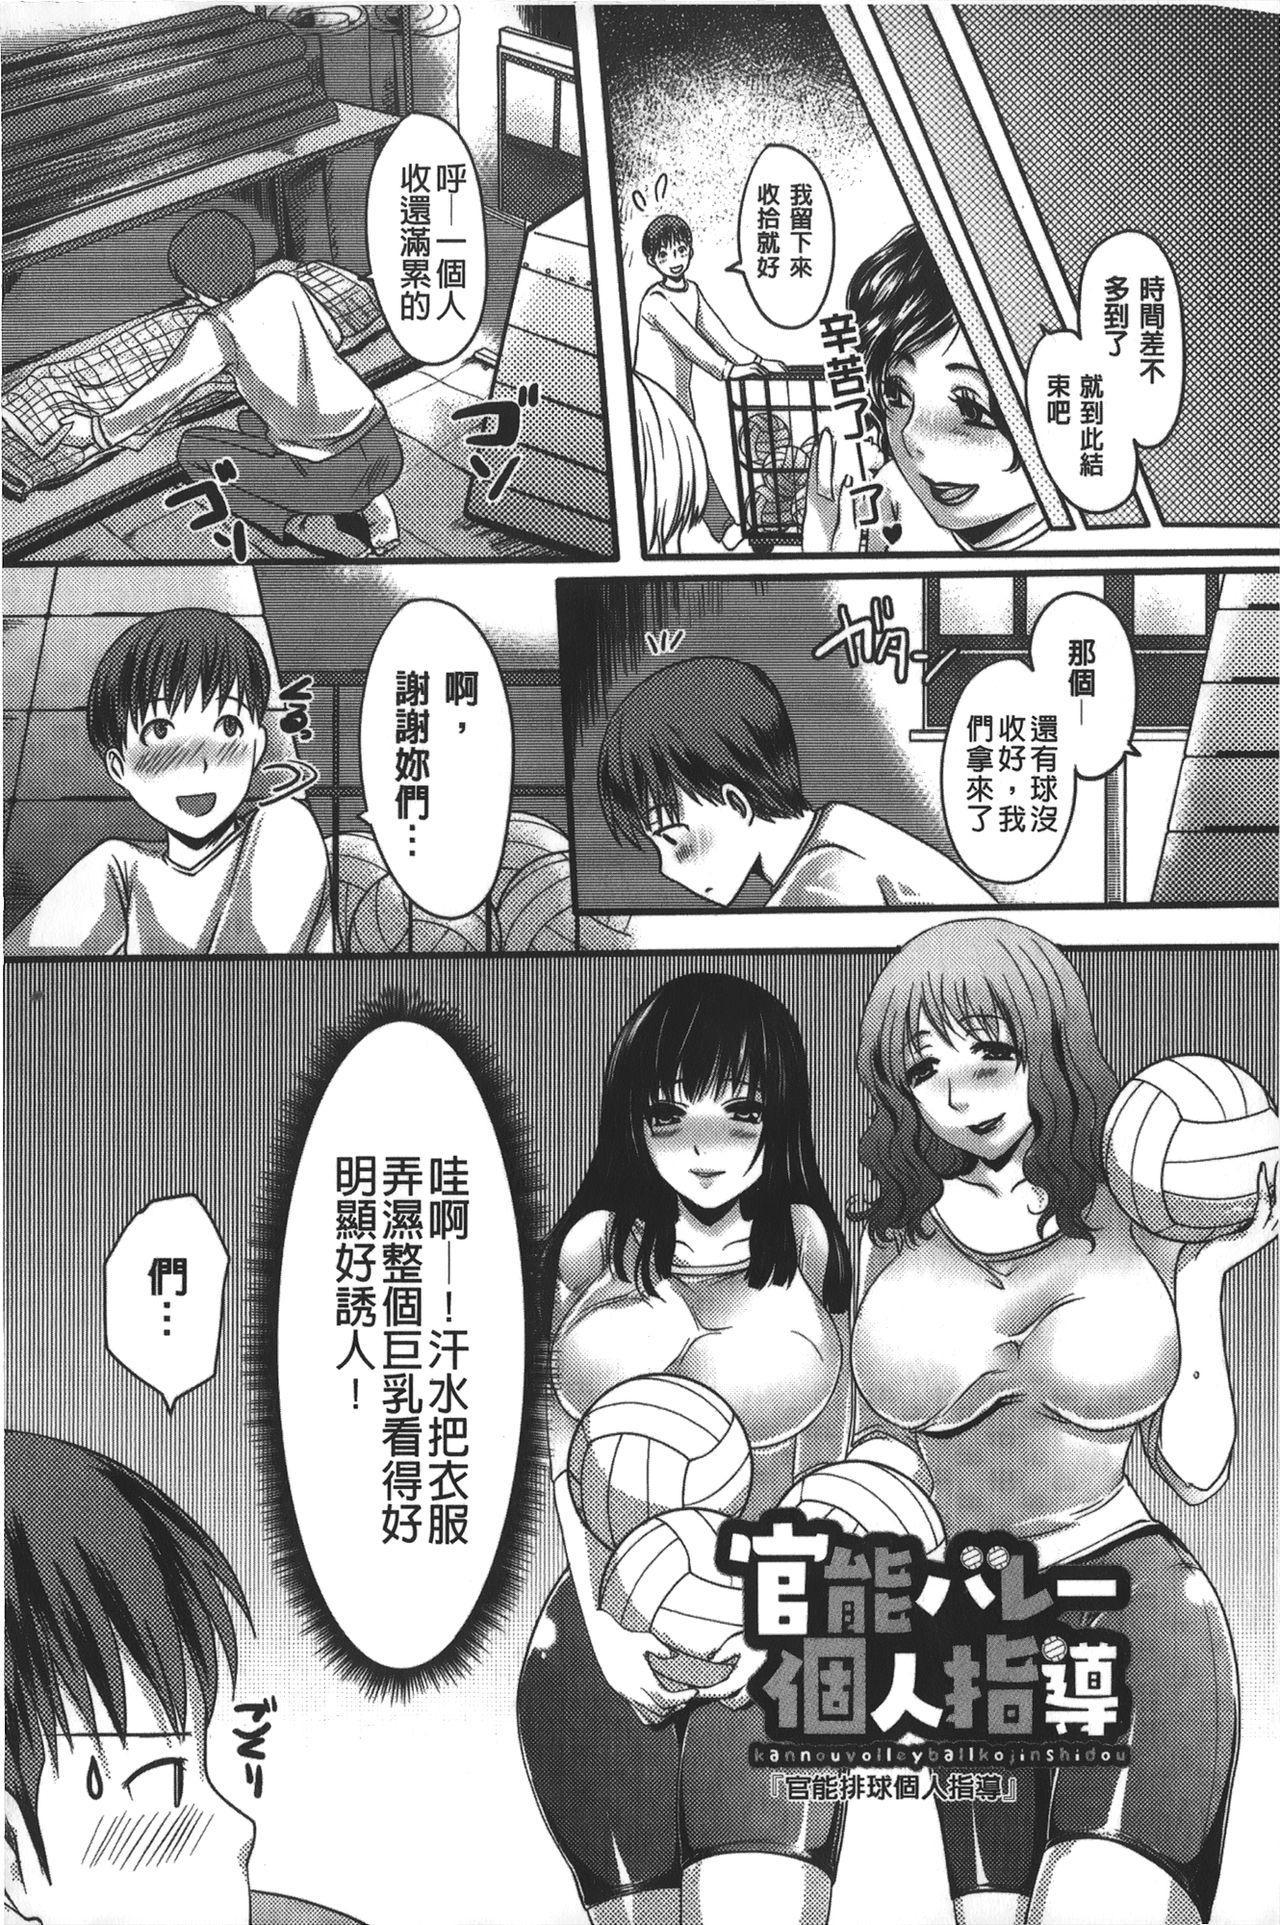 Kanjuku Torozuma 112